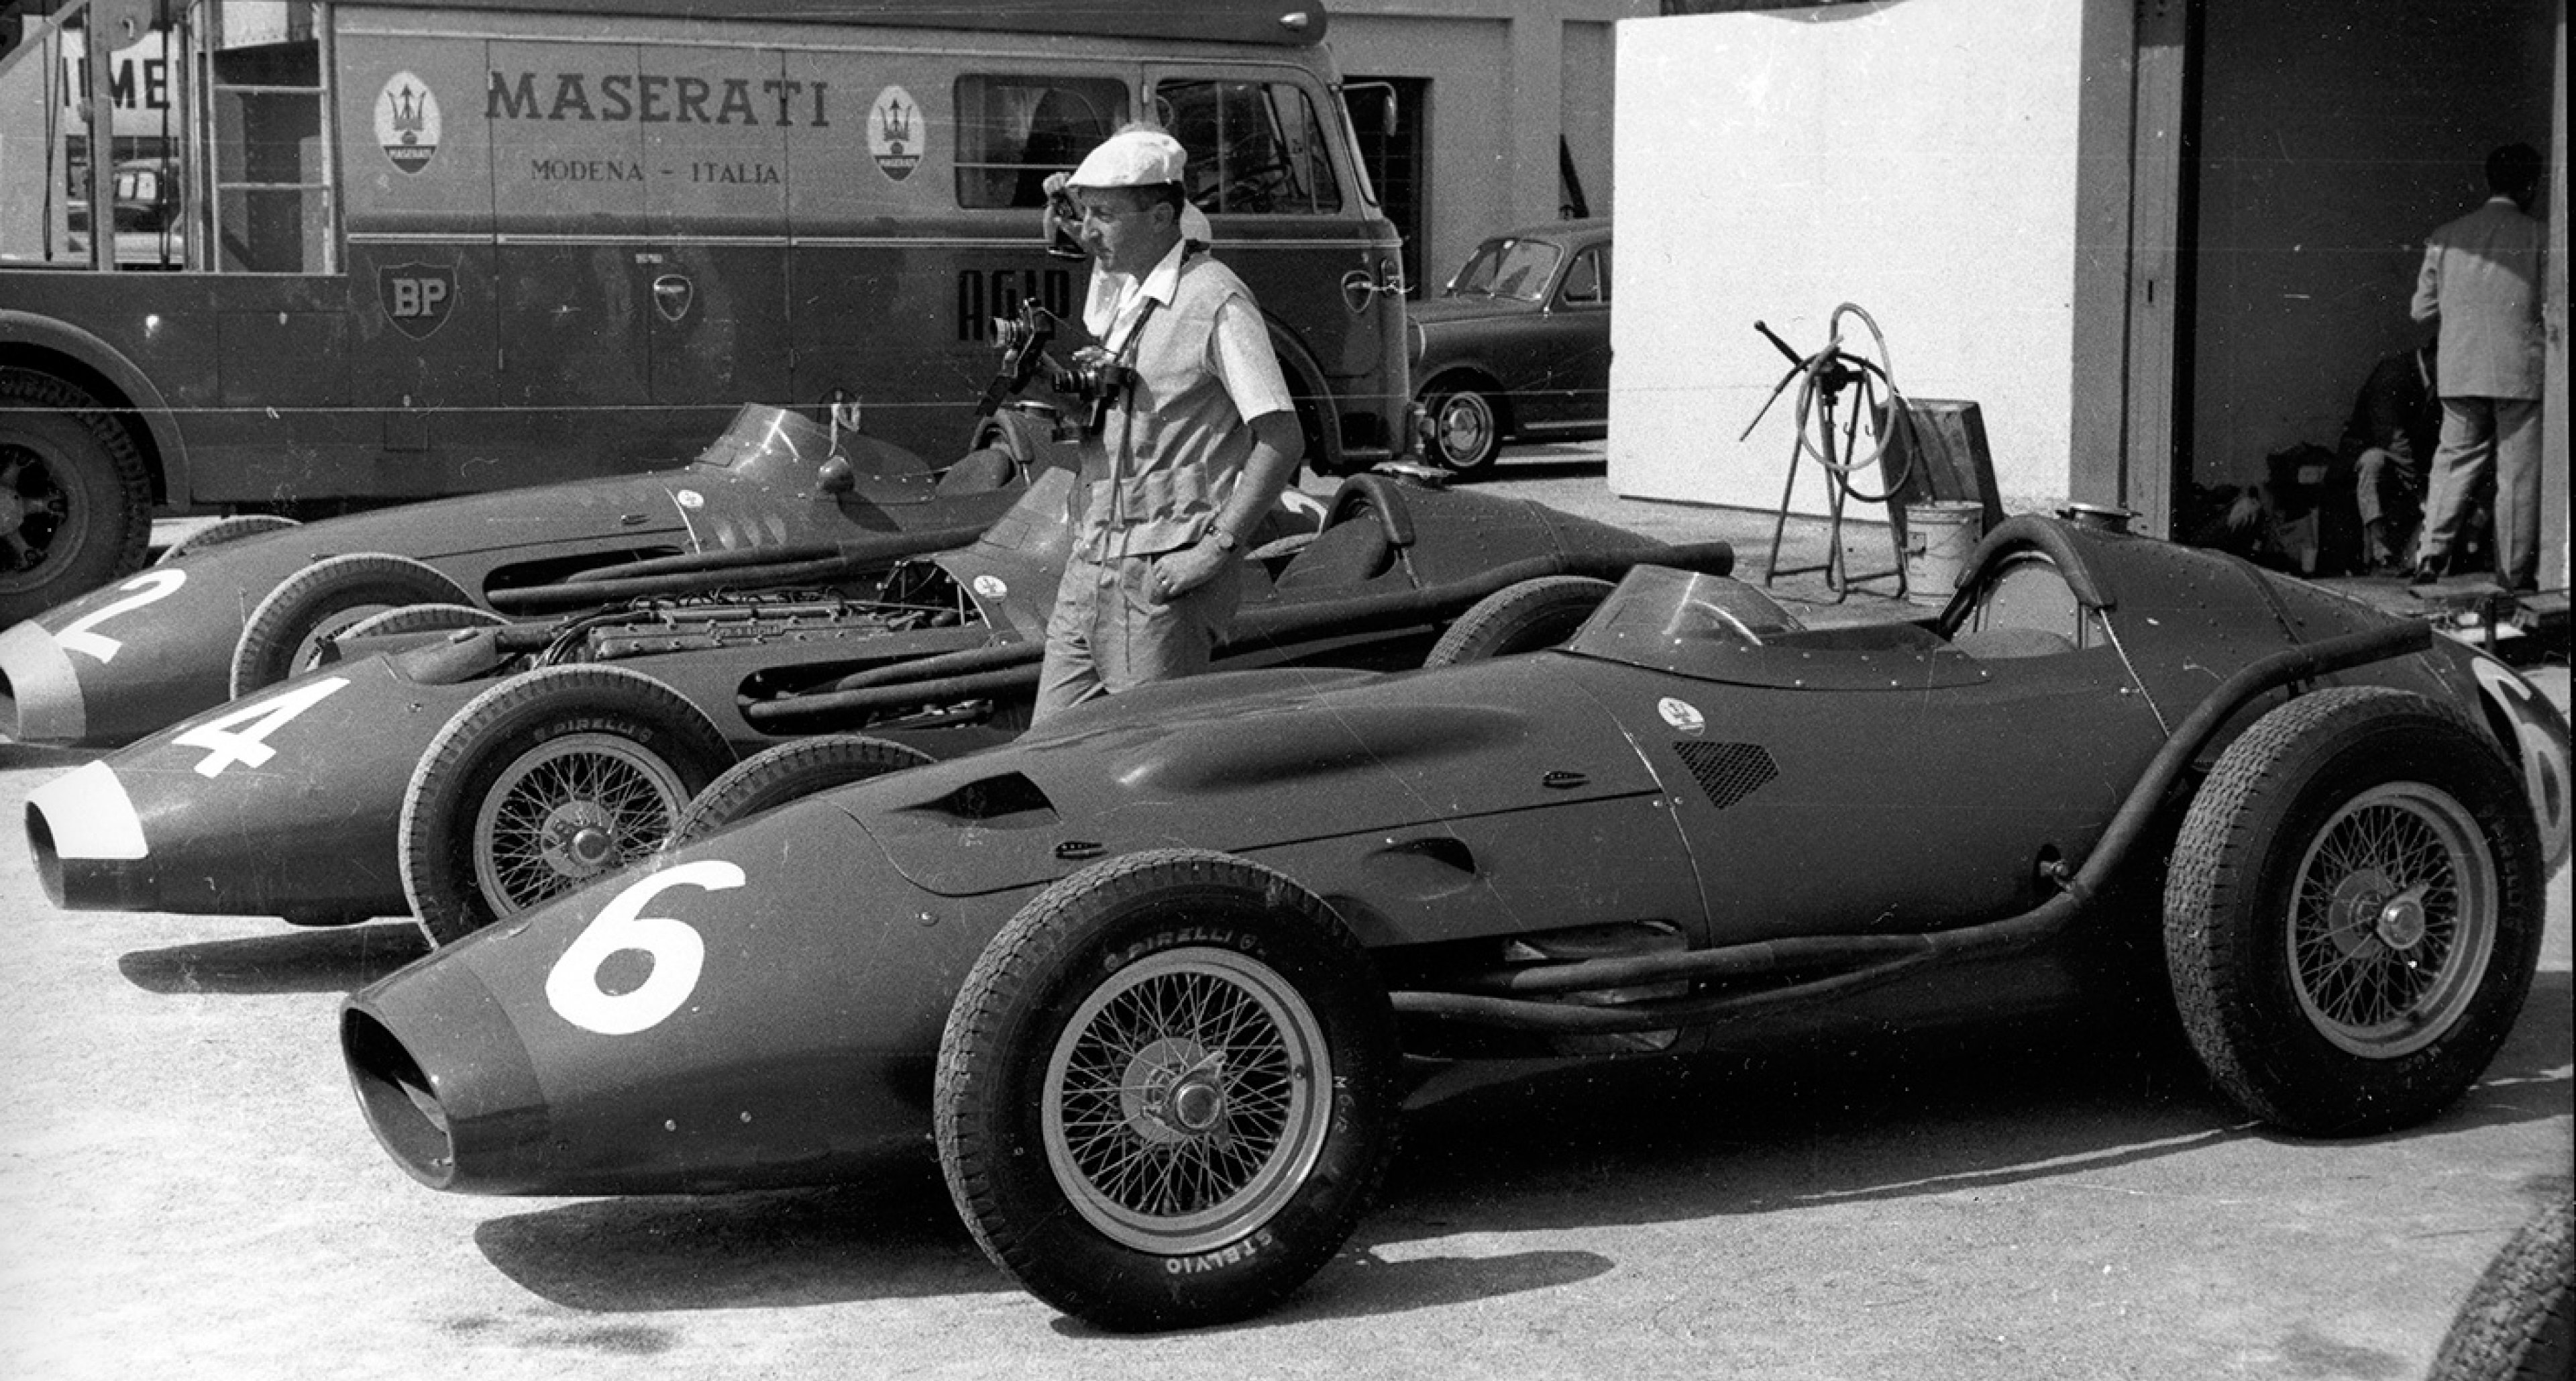 250Fs being prepared at Monza, 1956